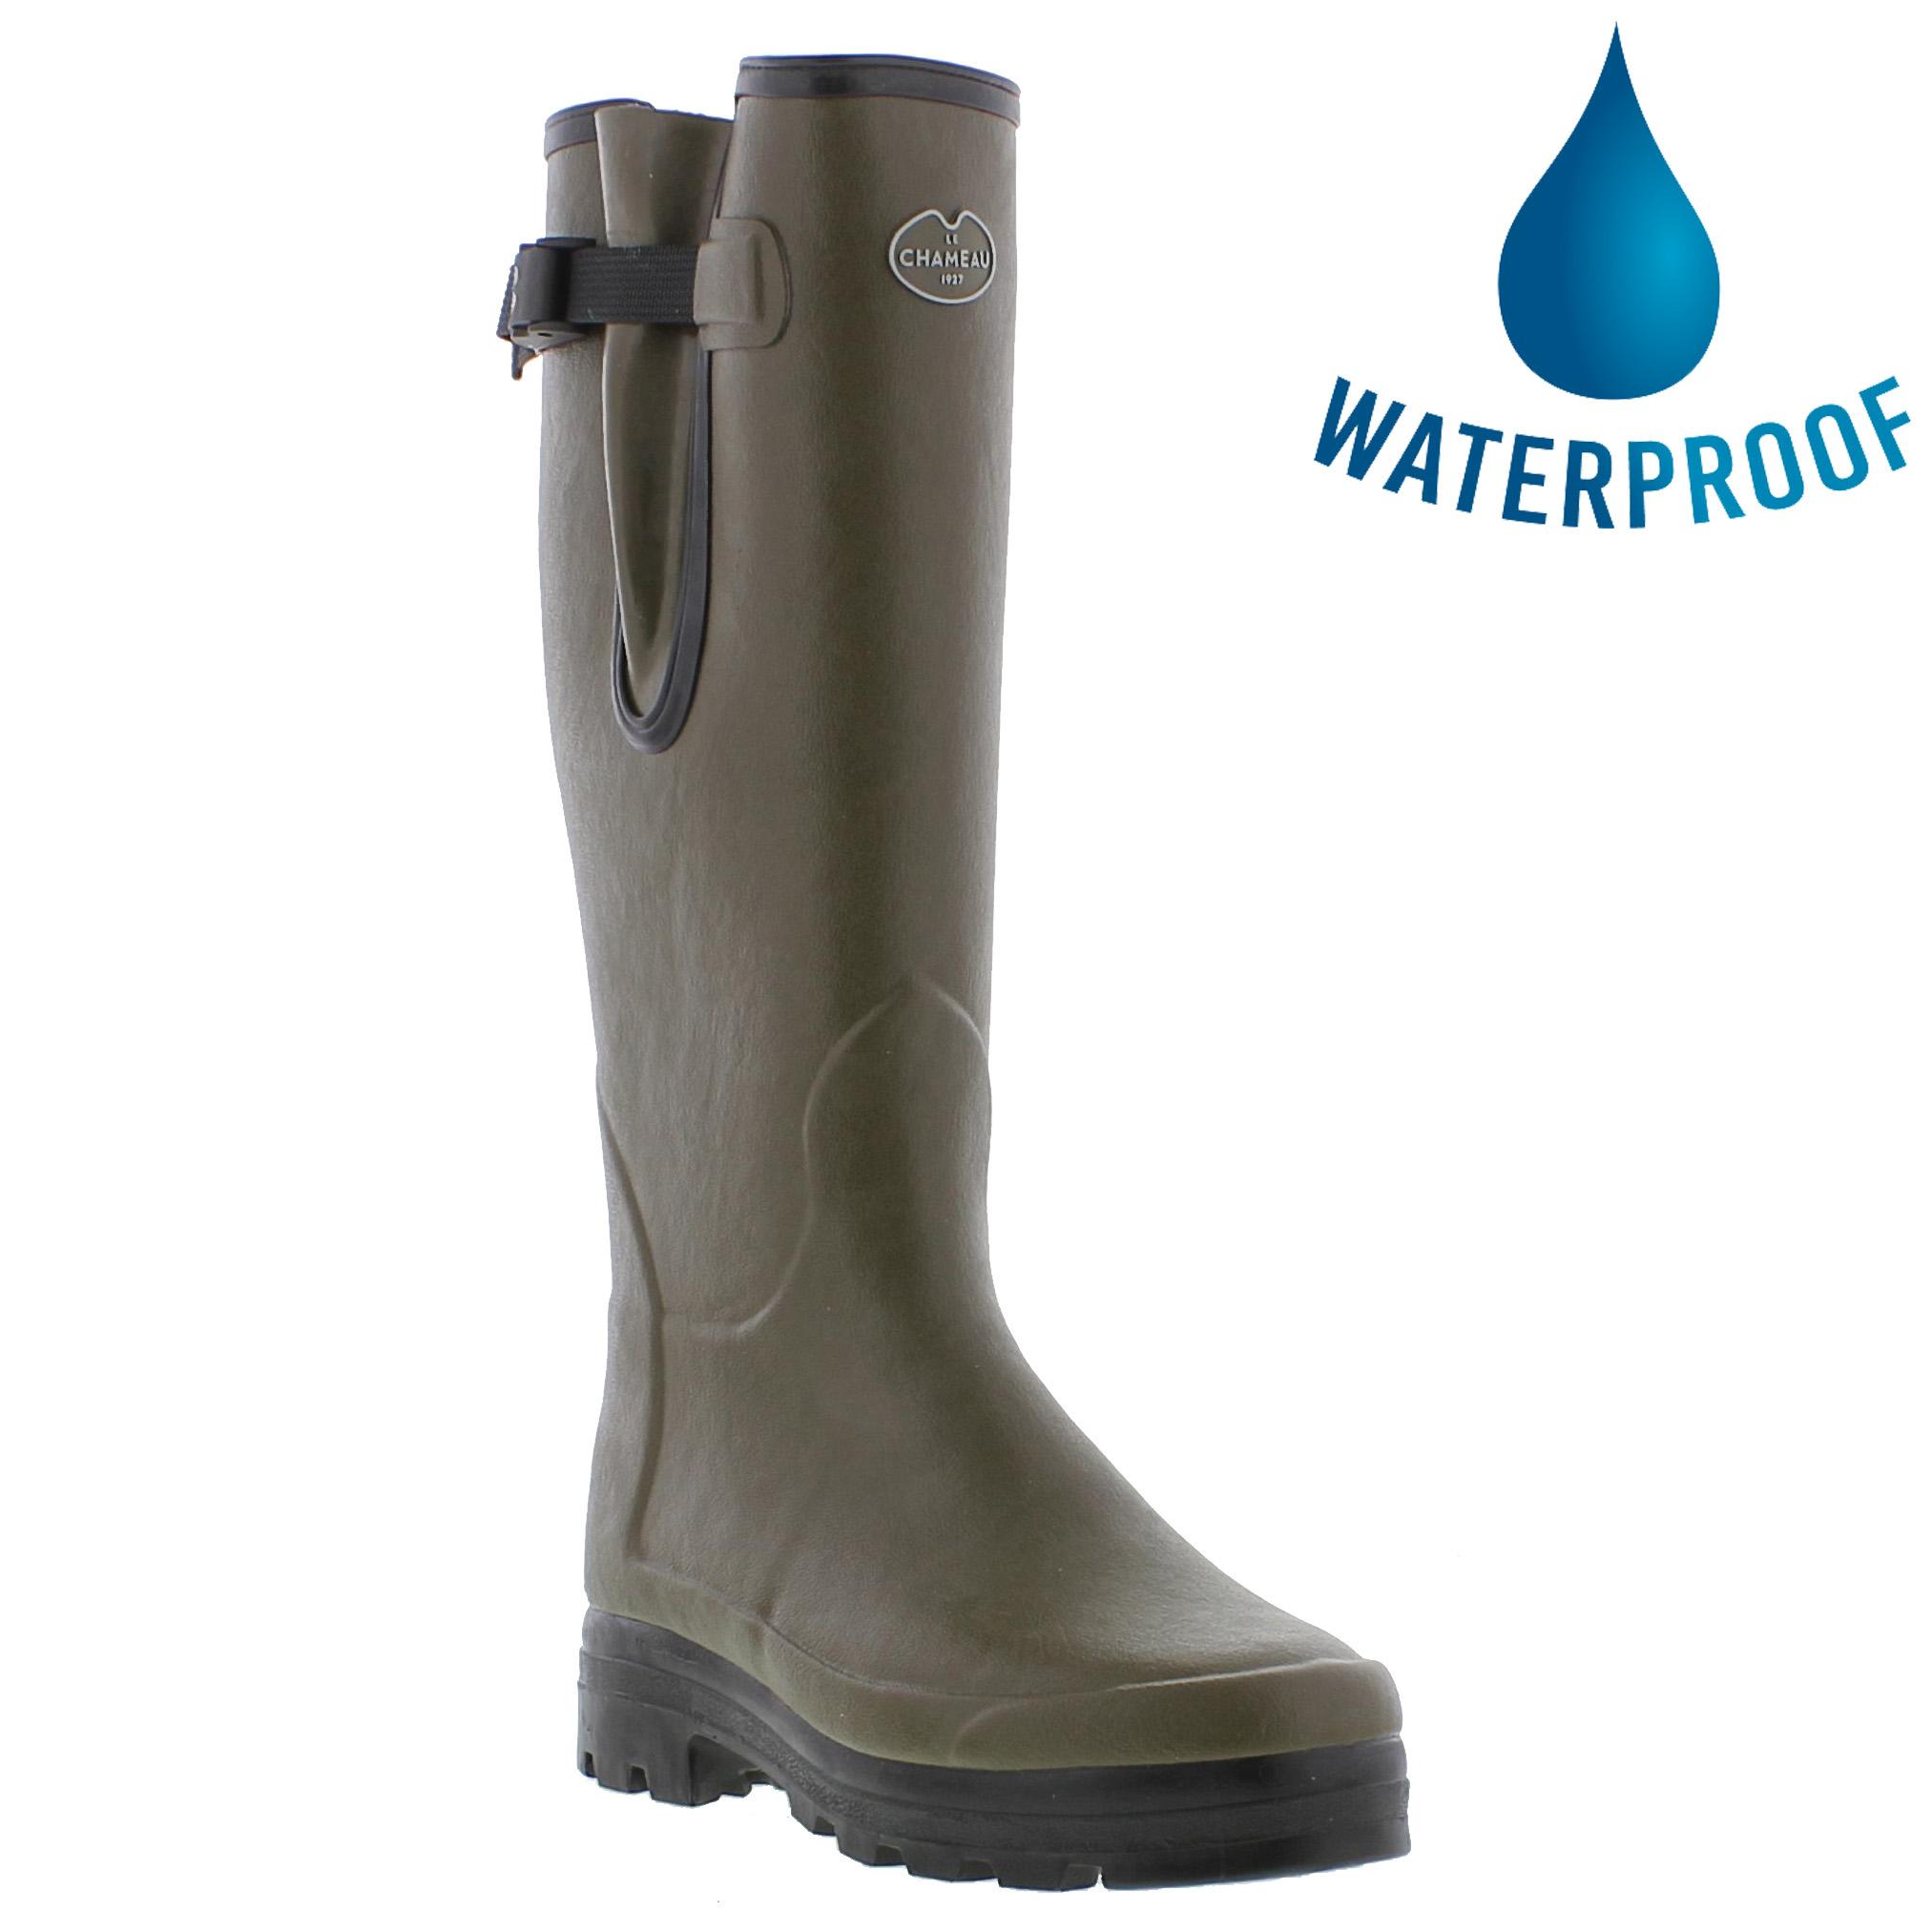 Le Chameau Mens Vierzonord Neoprene Lined Wellies Rain Boots - Vert Chameau